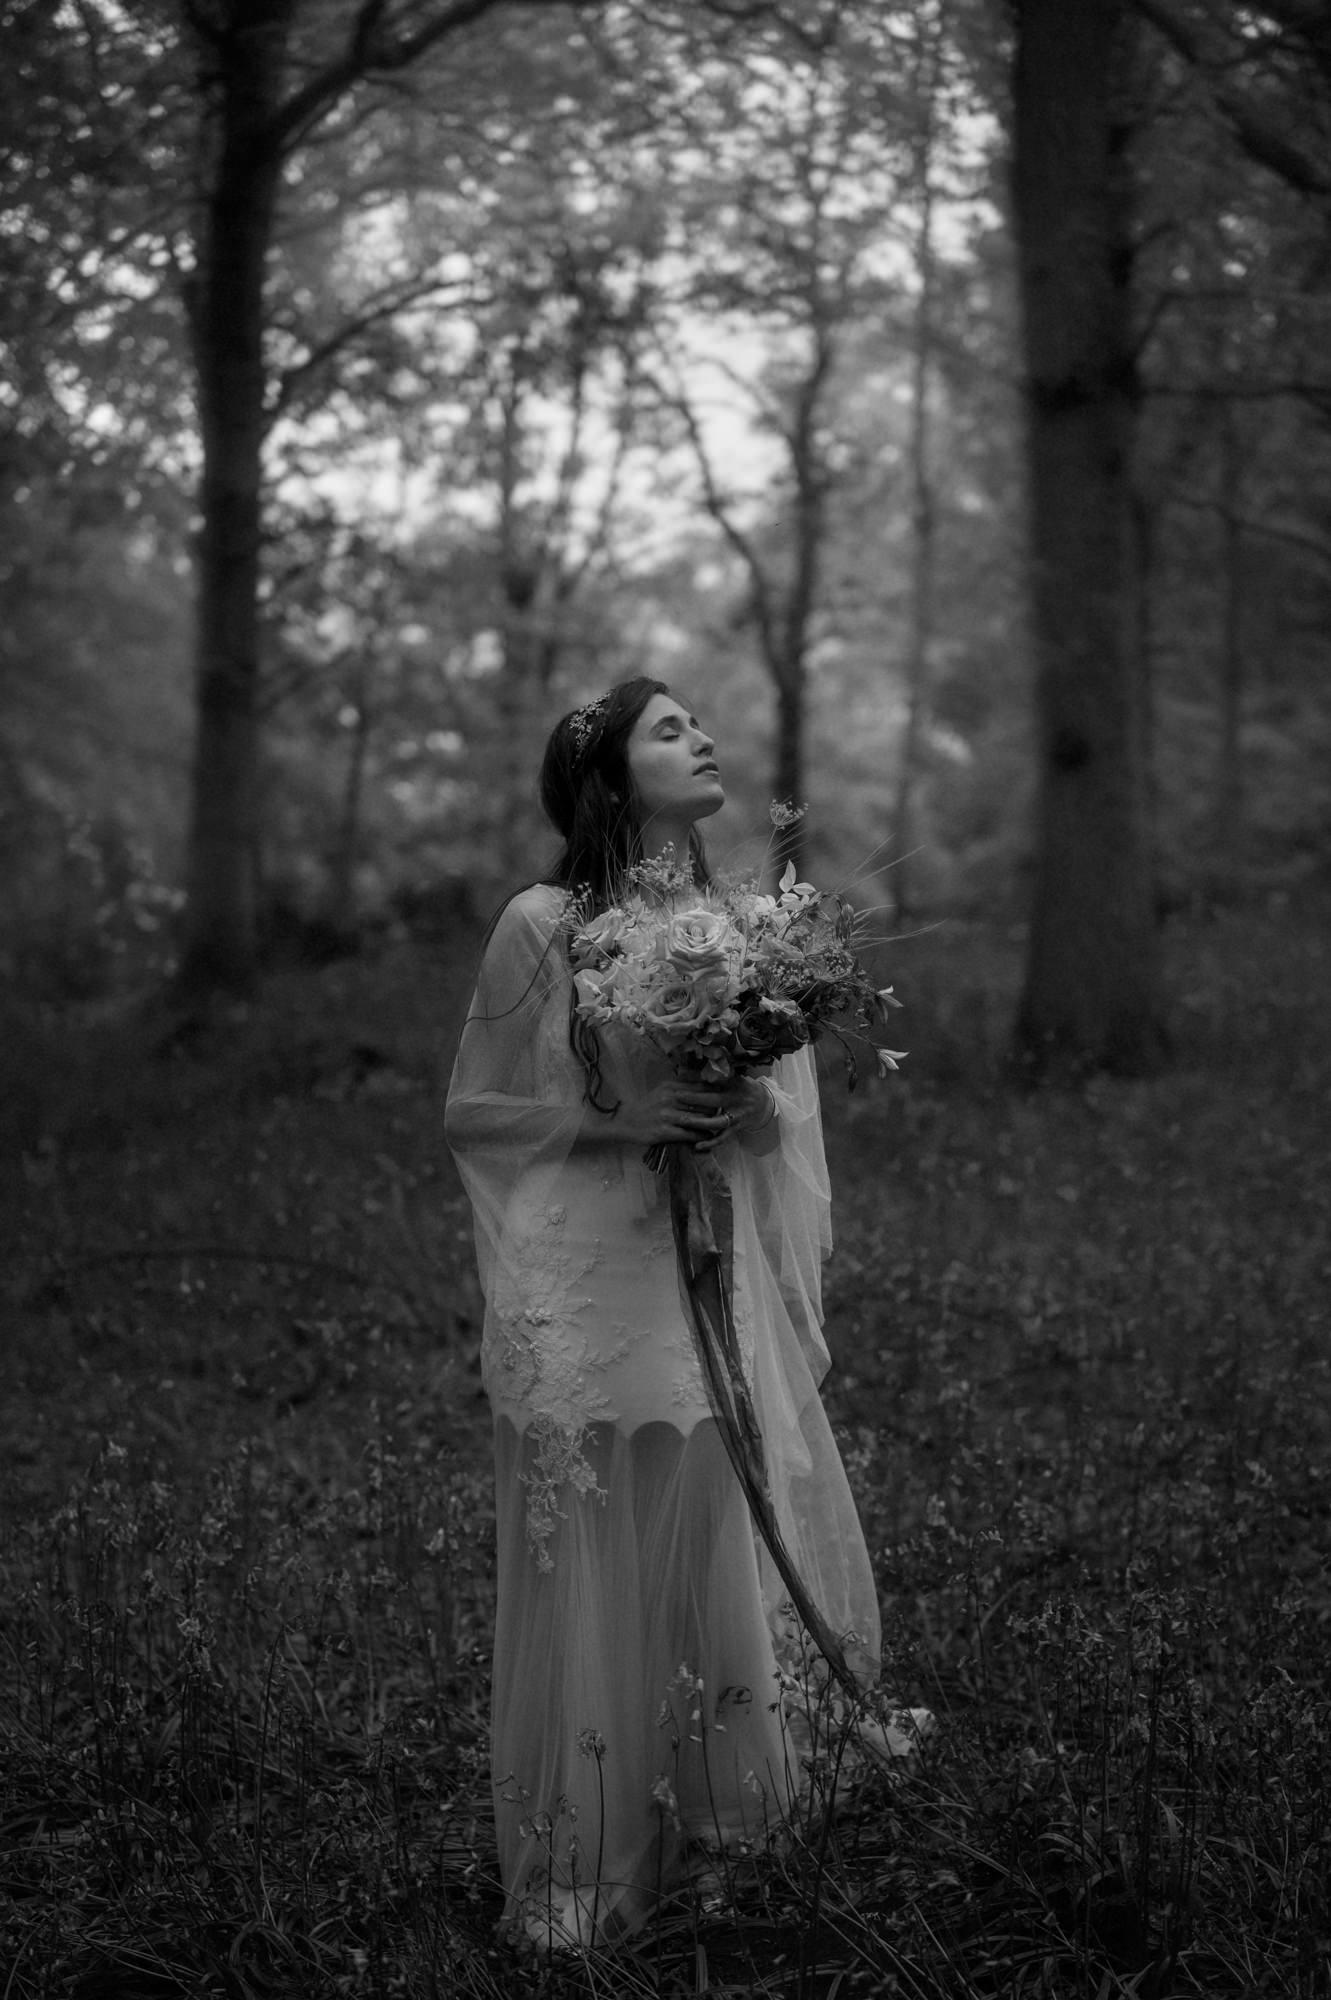 black-white-fine-art-ethereal-portrait-of-bride-in-forest-worlds-best-wedding-photos-the-kitcheners-scotland-wedding-photographers